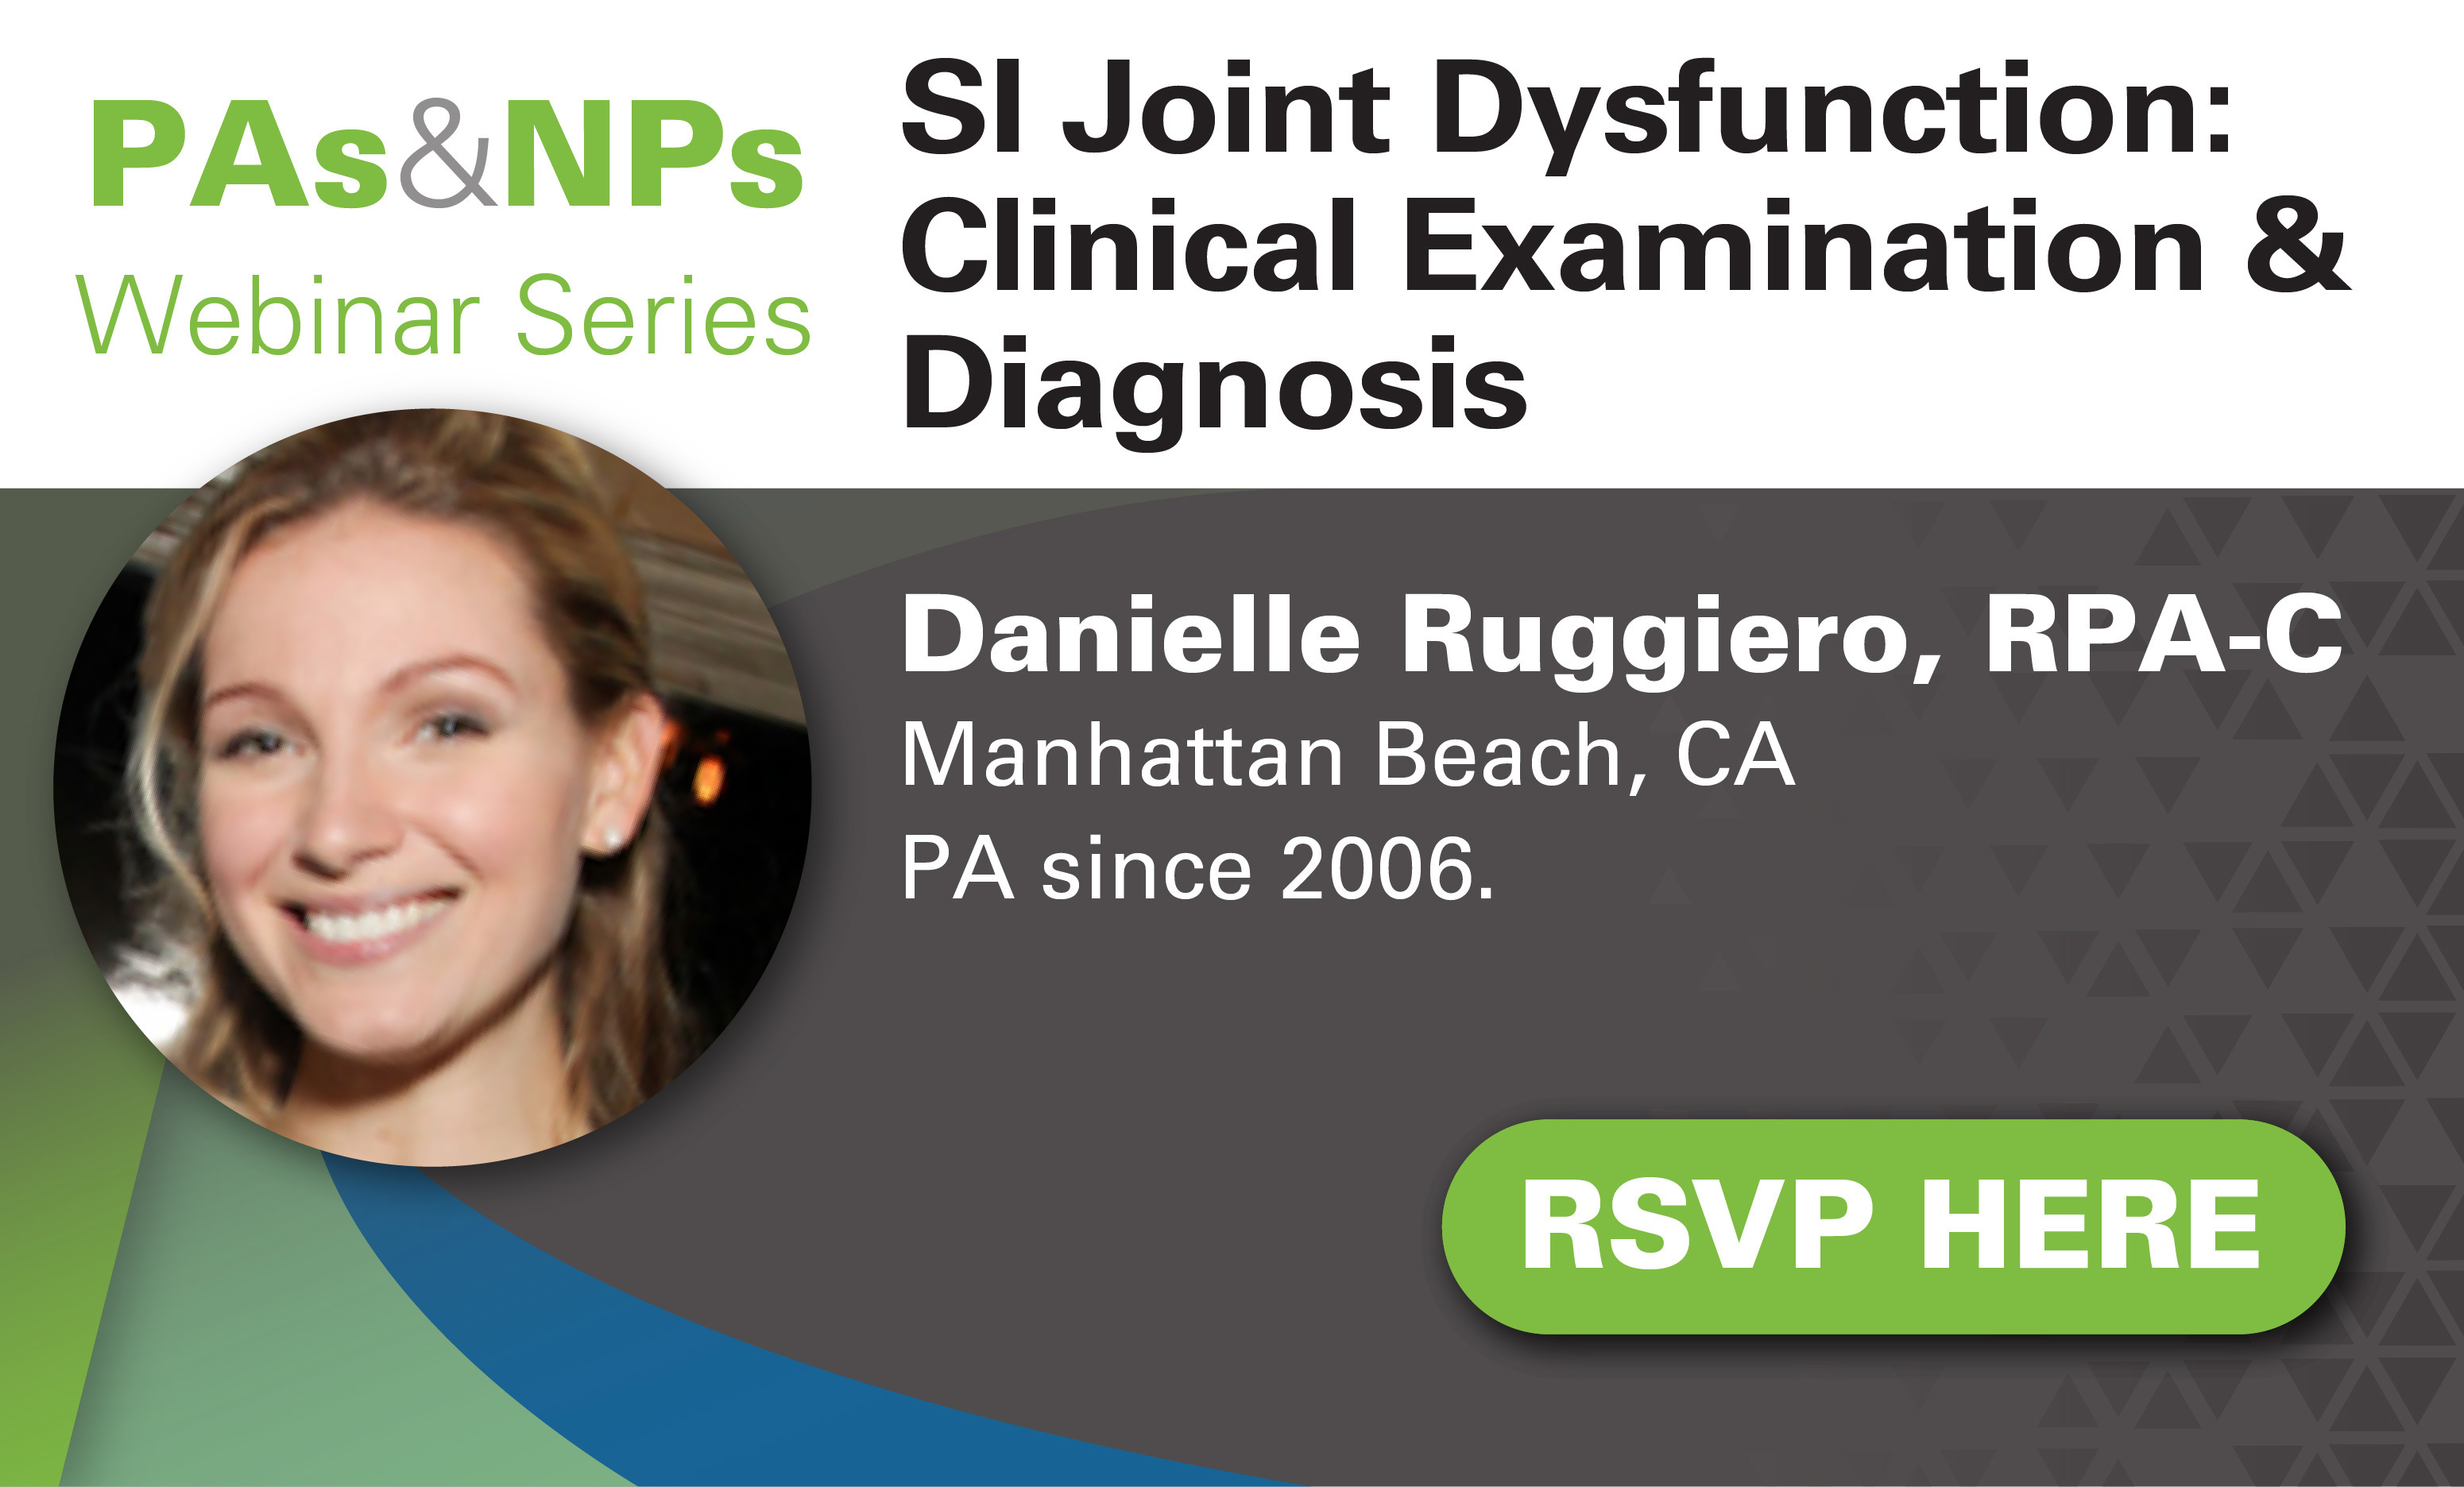 Virtual Ed - Mar 27 - Ruggiero - SIJ Clinical Exam